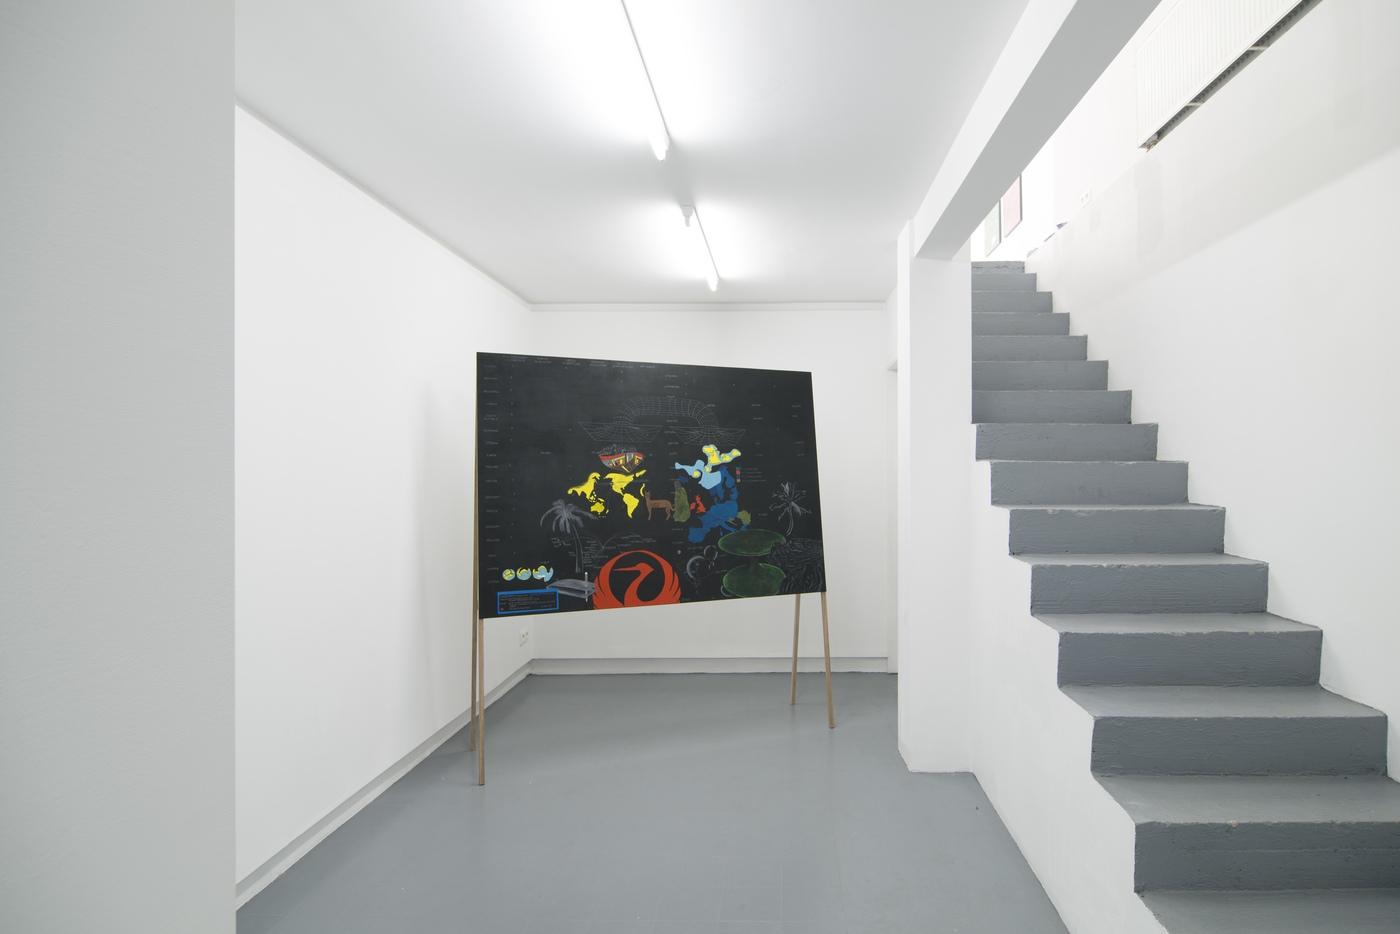 Raffaella Crispino_Tokyo-San Francisco_installation view 1